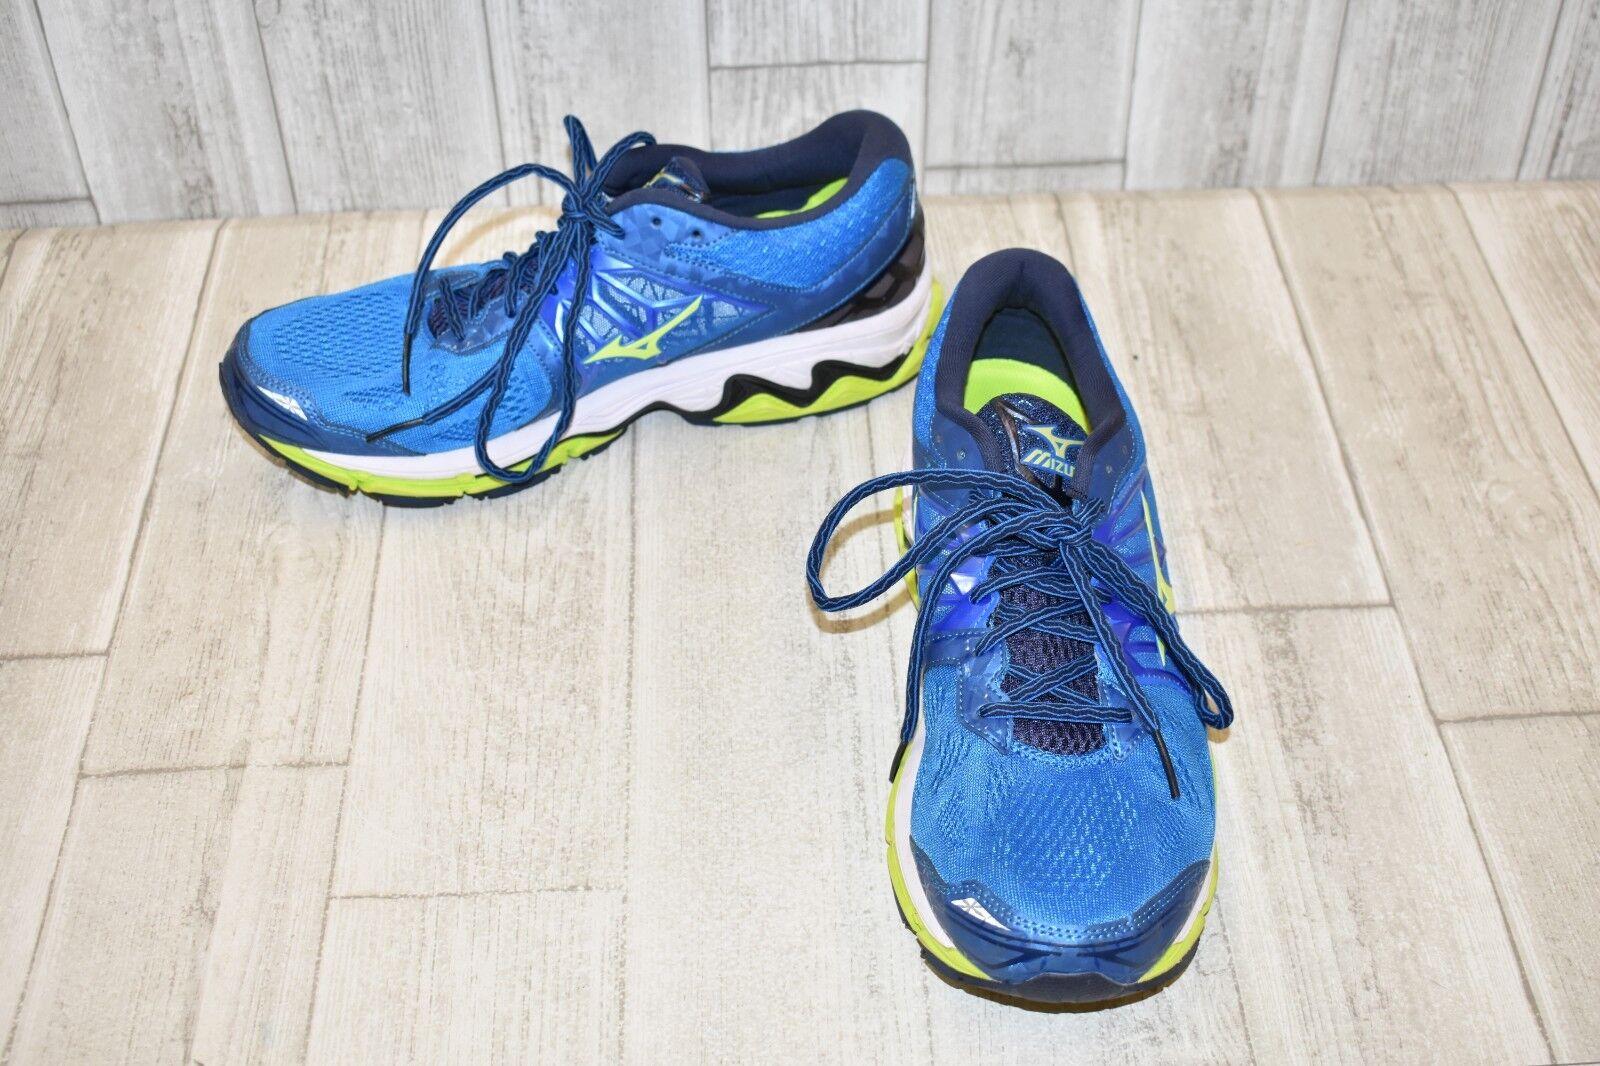 Mizuno Wave Horizon 2 Running shoes - Men's Size 12, bluee Lime